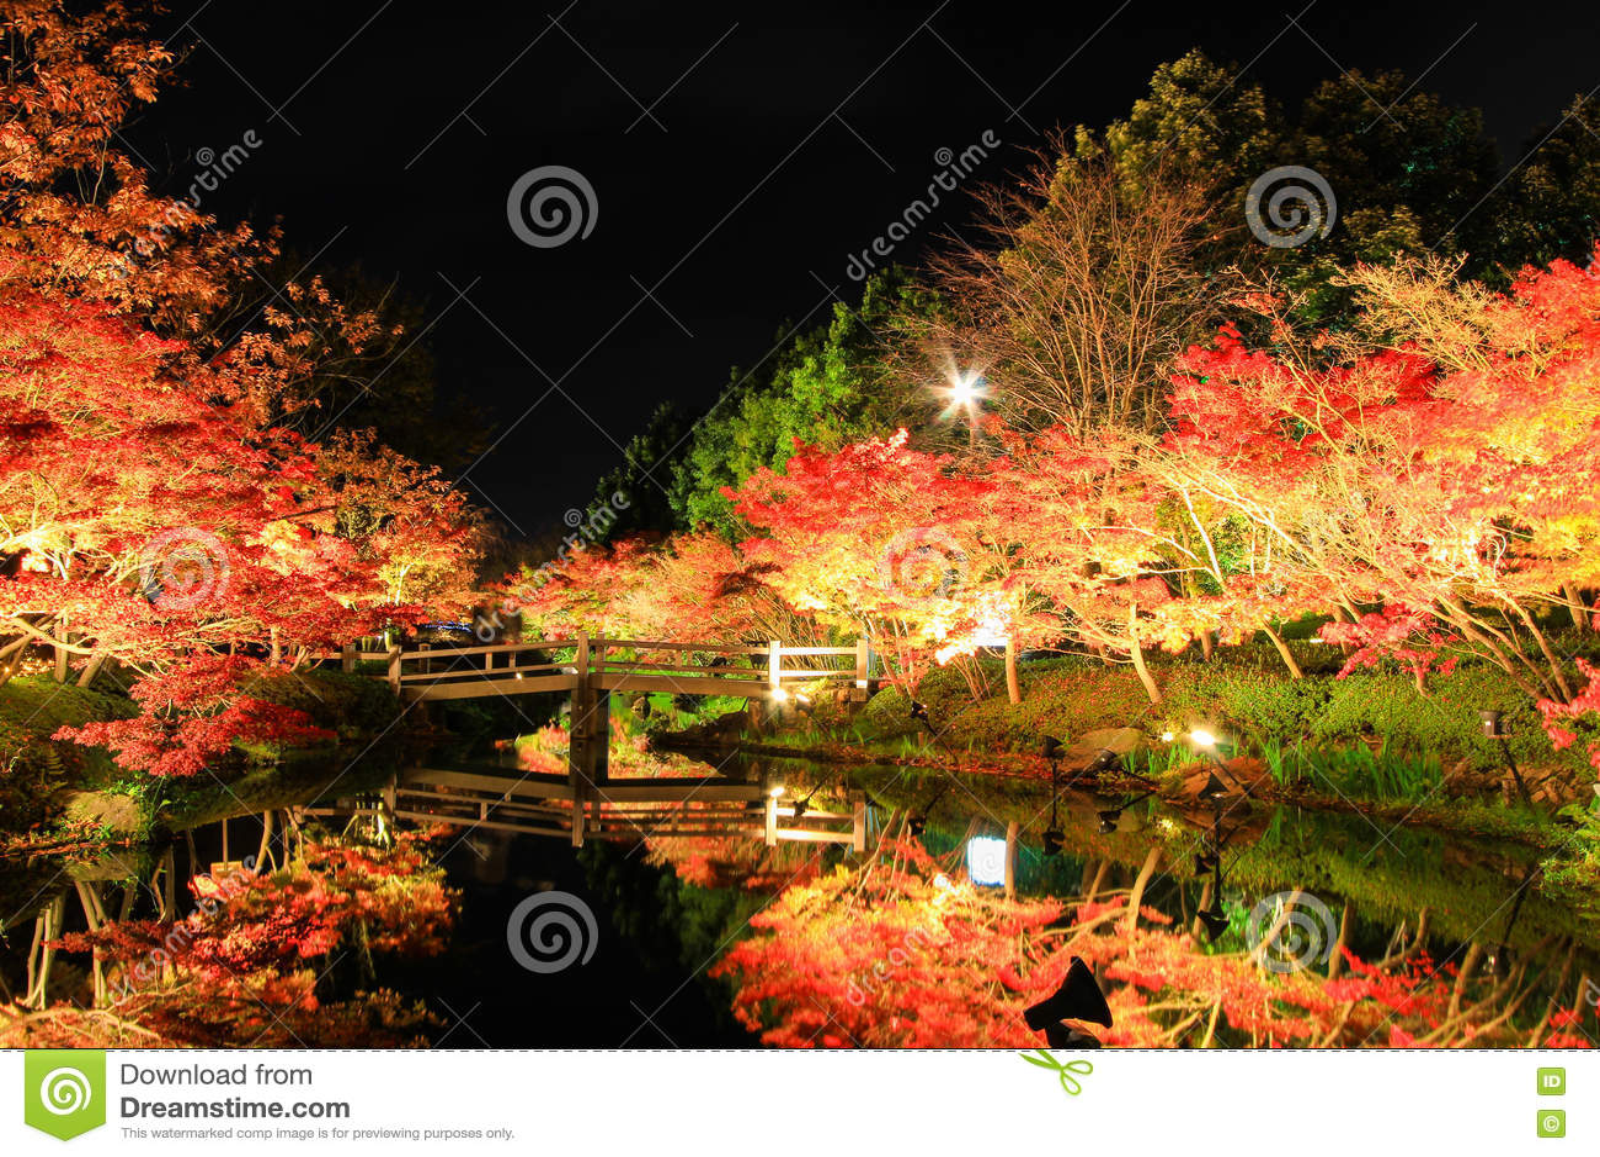 Illumination at Nabana no Sato,Mie,Japan,with attractive autumn leaves